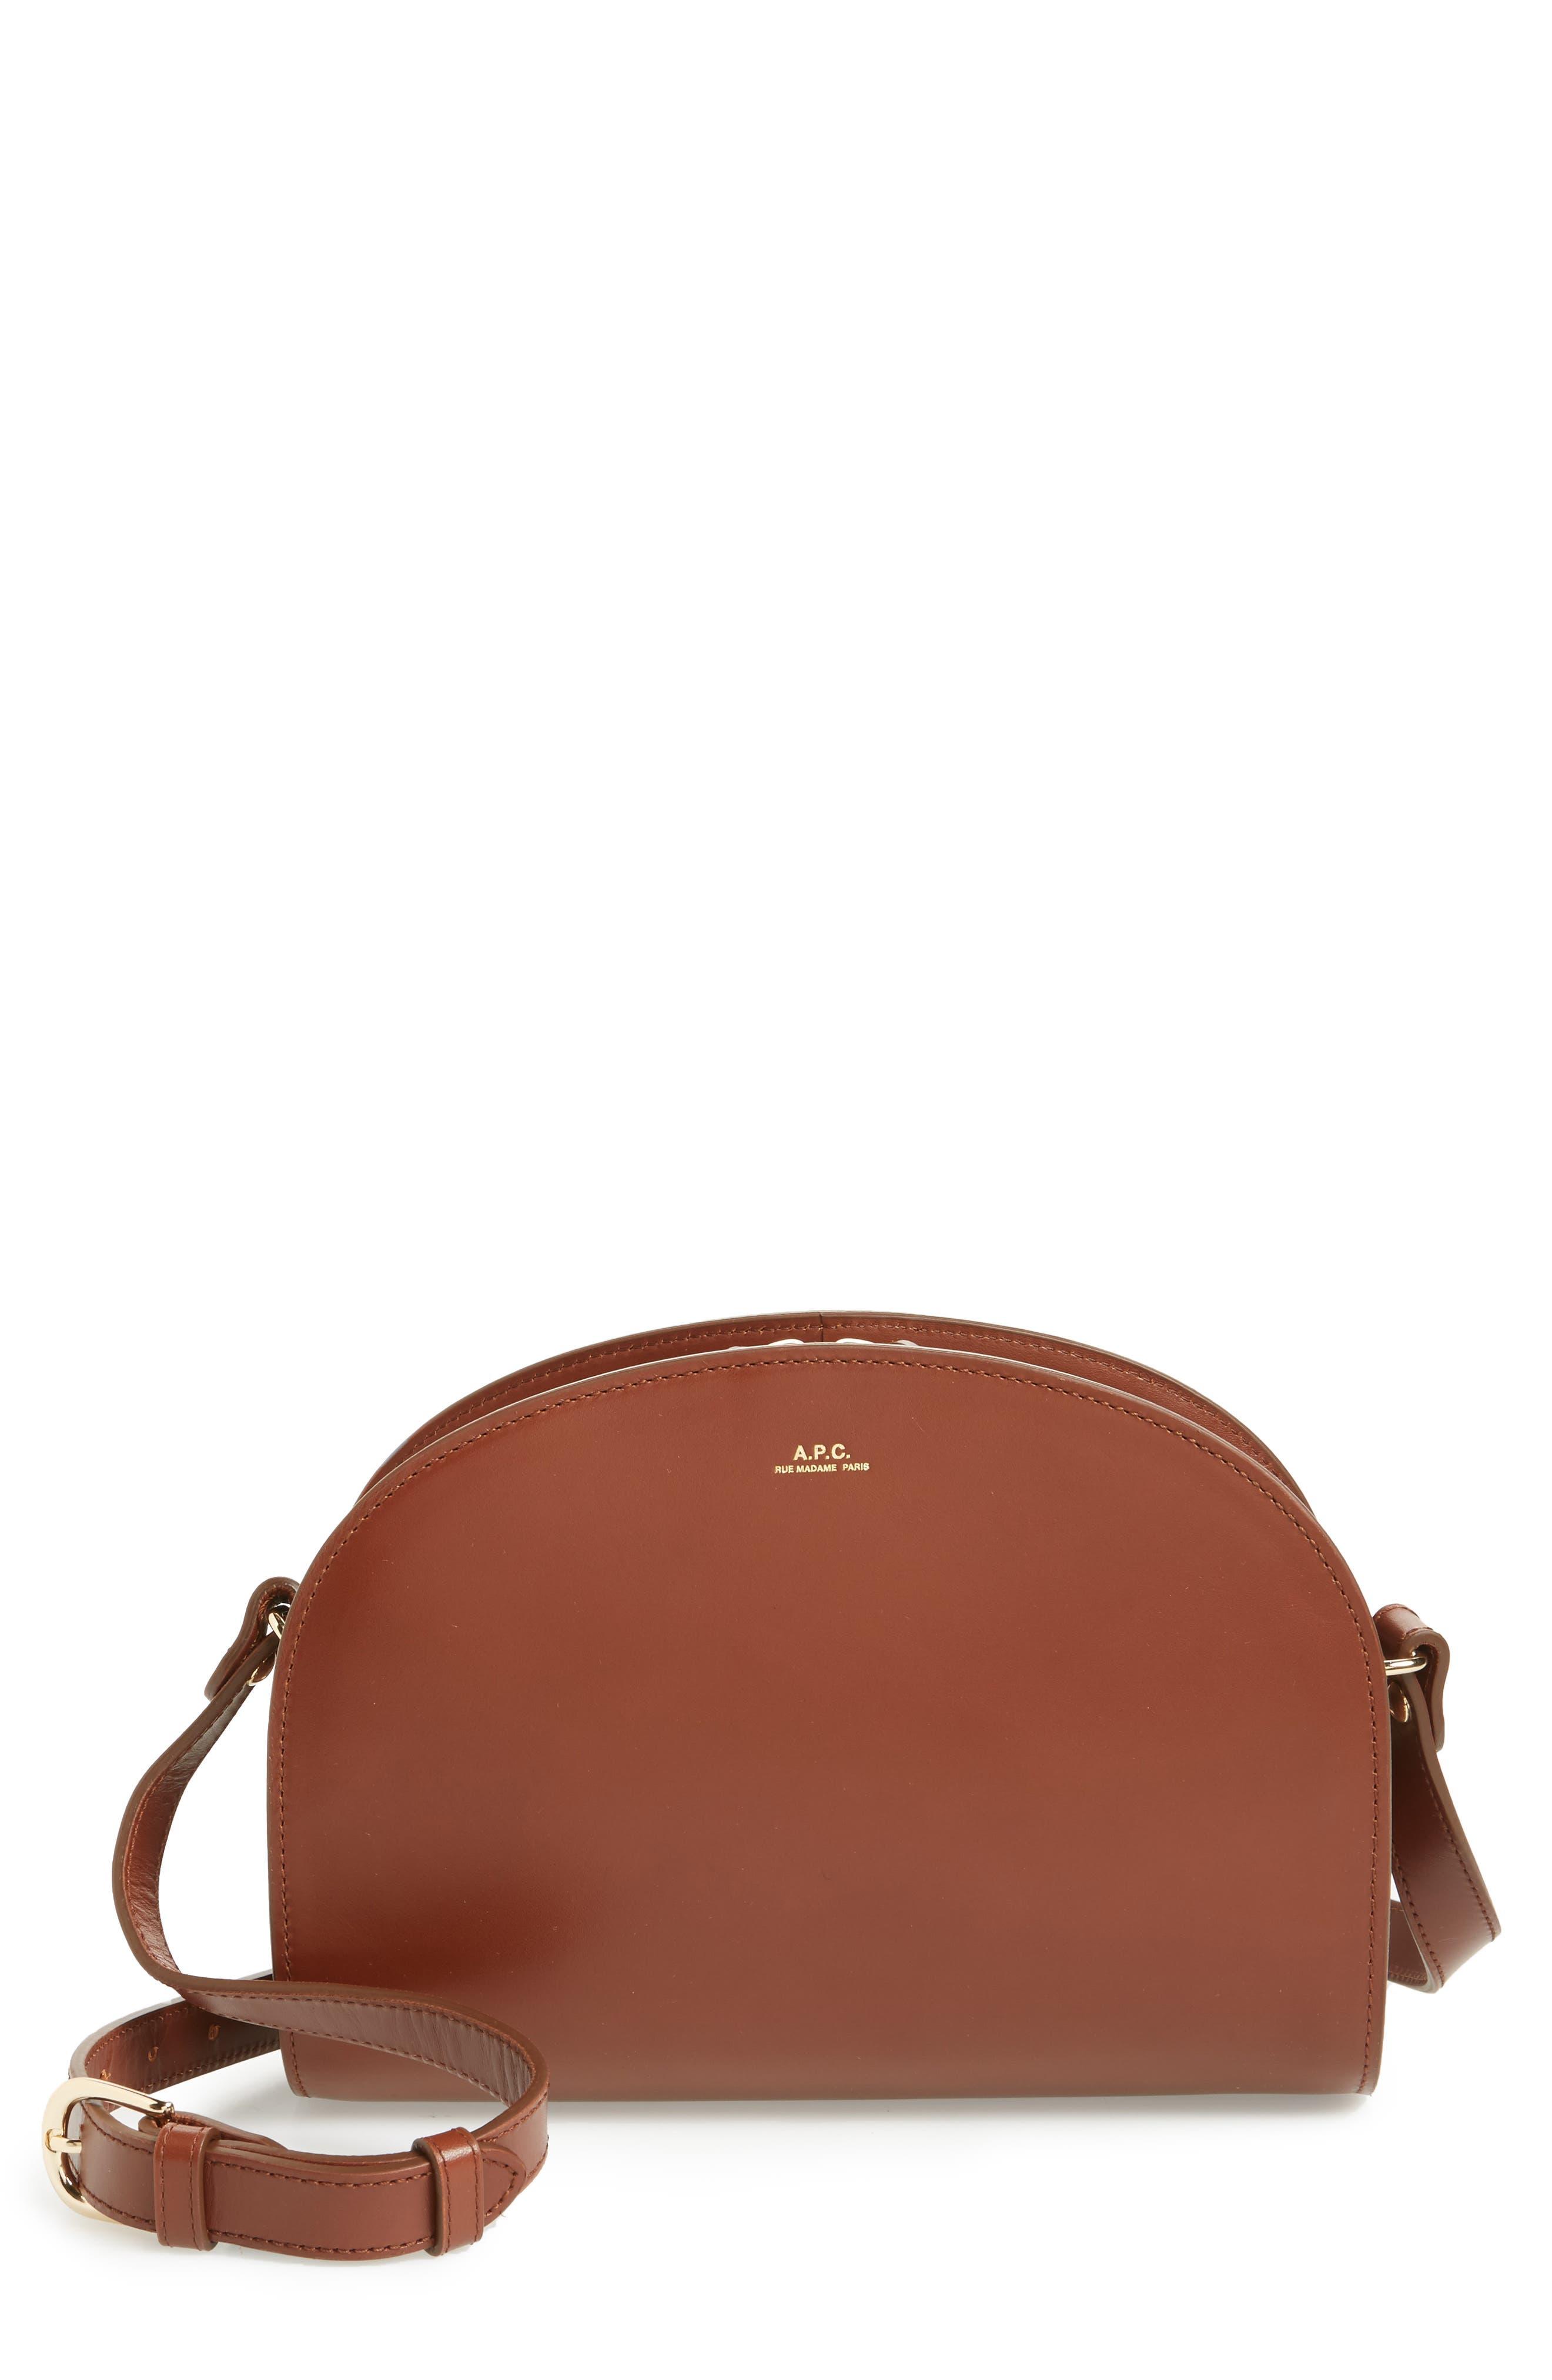 'Sac Demi Lune' Leather Crossbody Bag,                         Main,                         color, NOISETTE